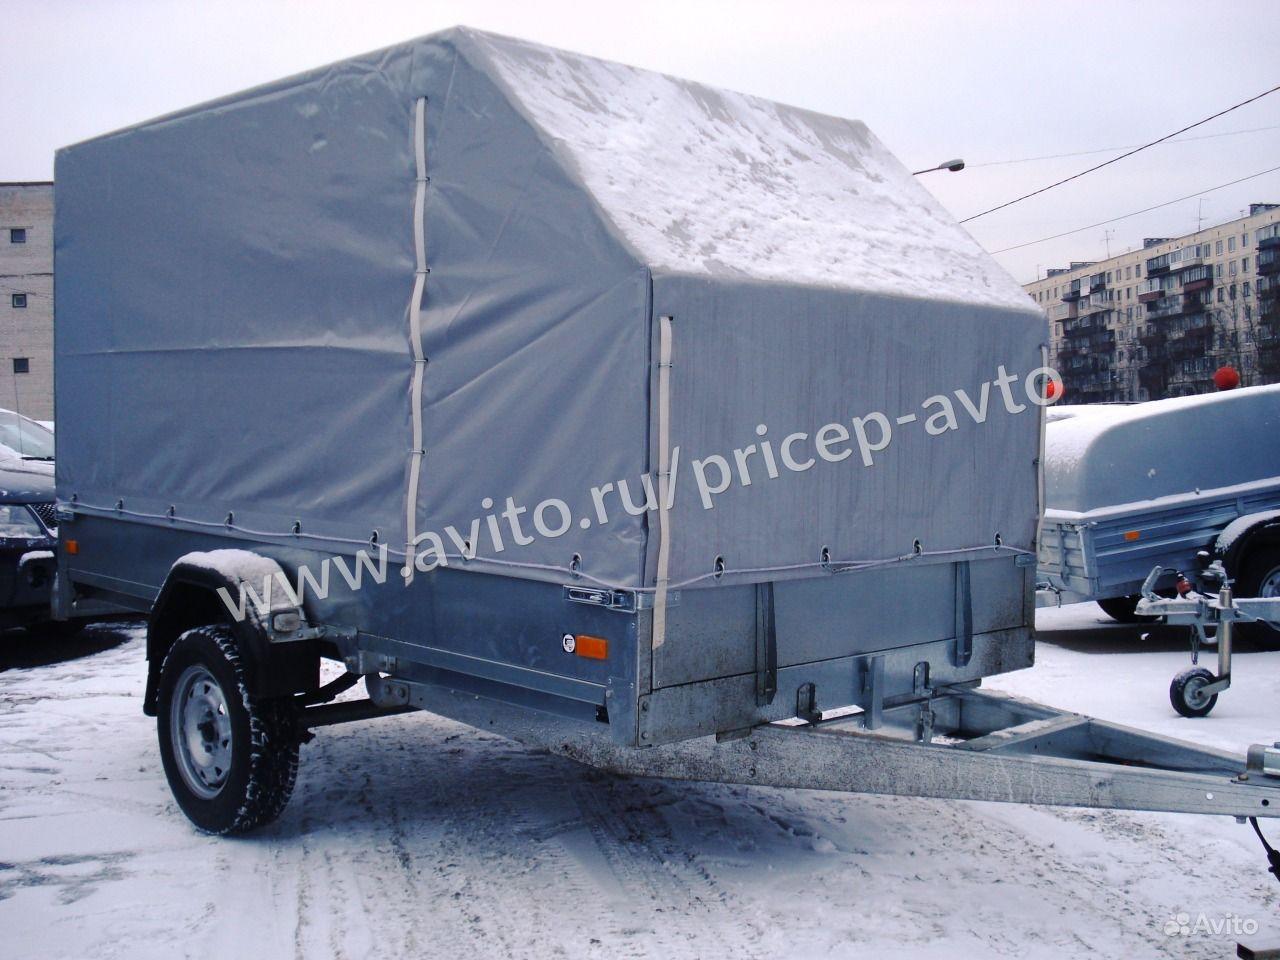 hanza запчасти легковые автомобили петербург: